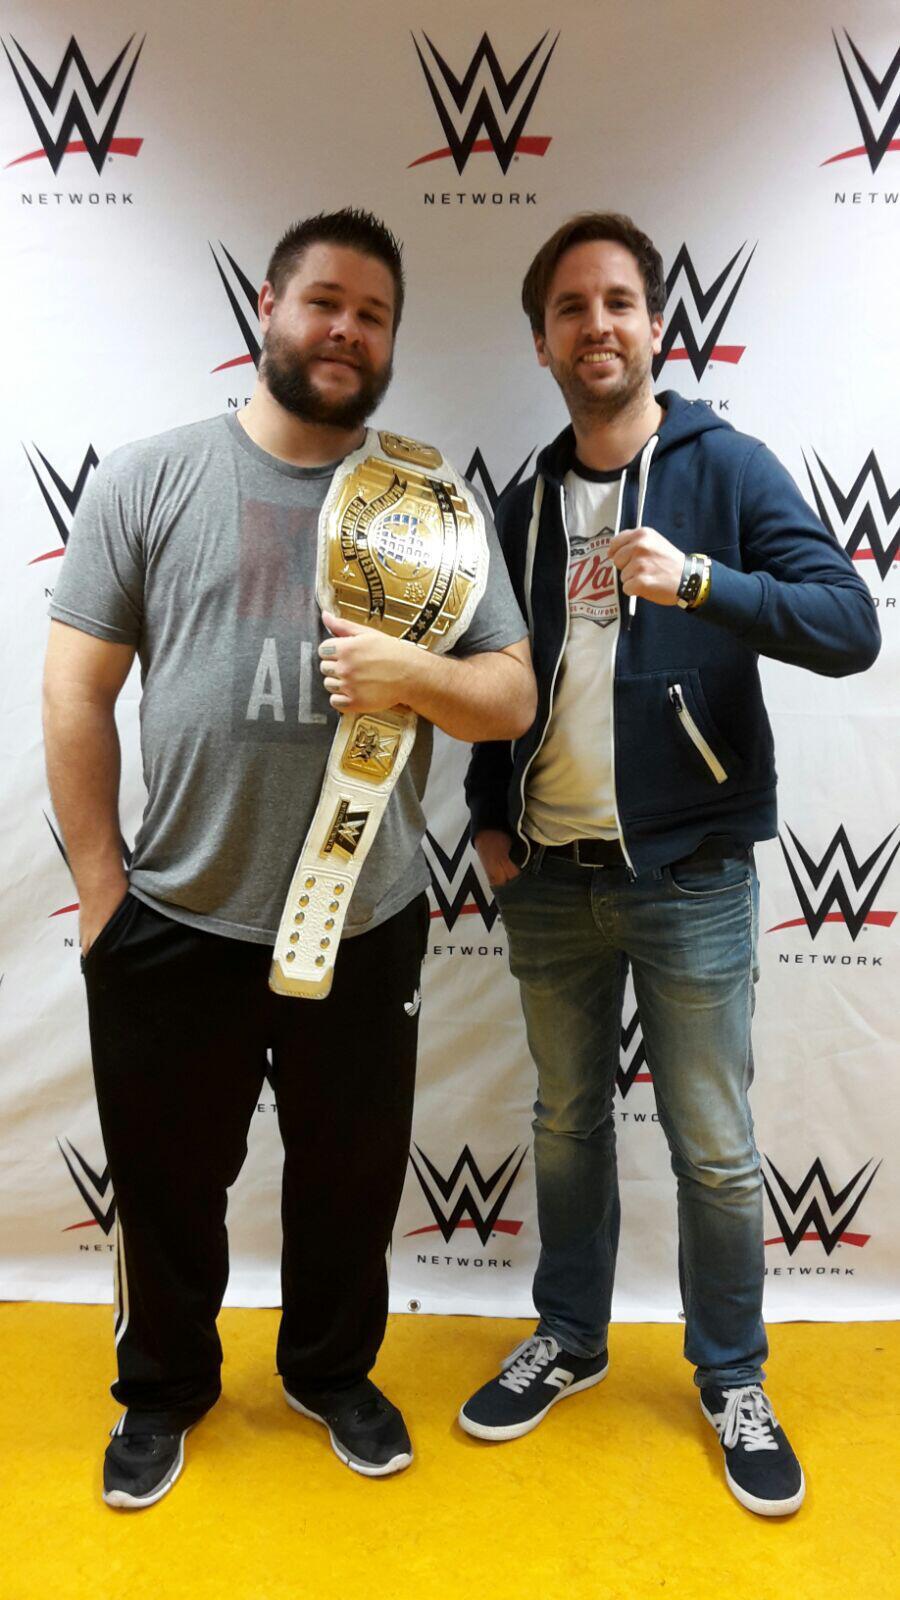 Bild zu Andreas Maciejewski, Kevin Owens, WWE